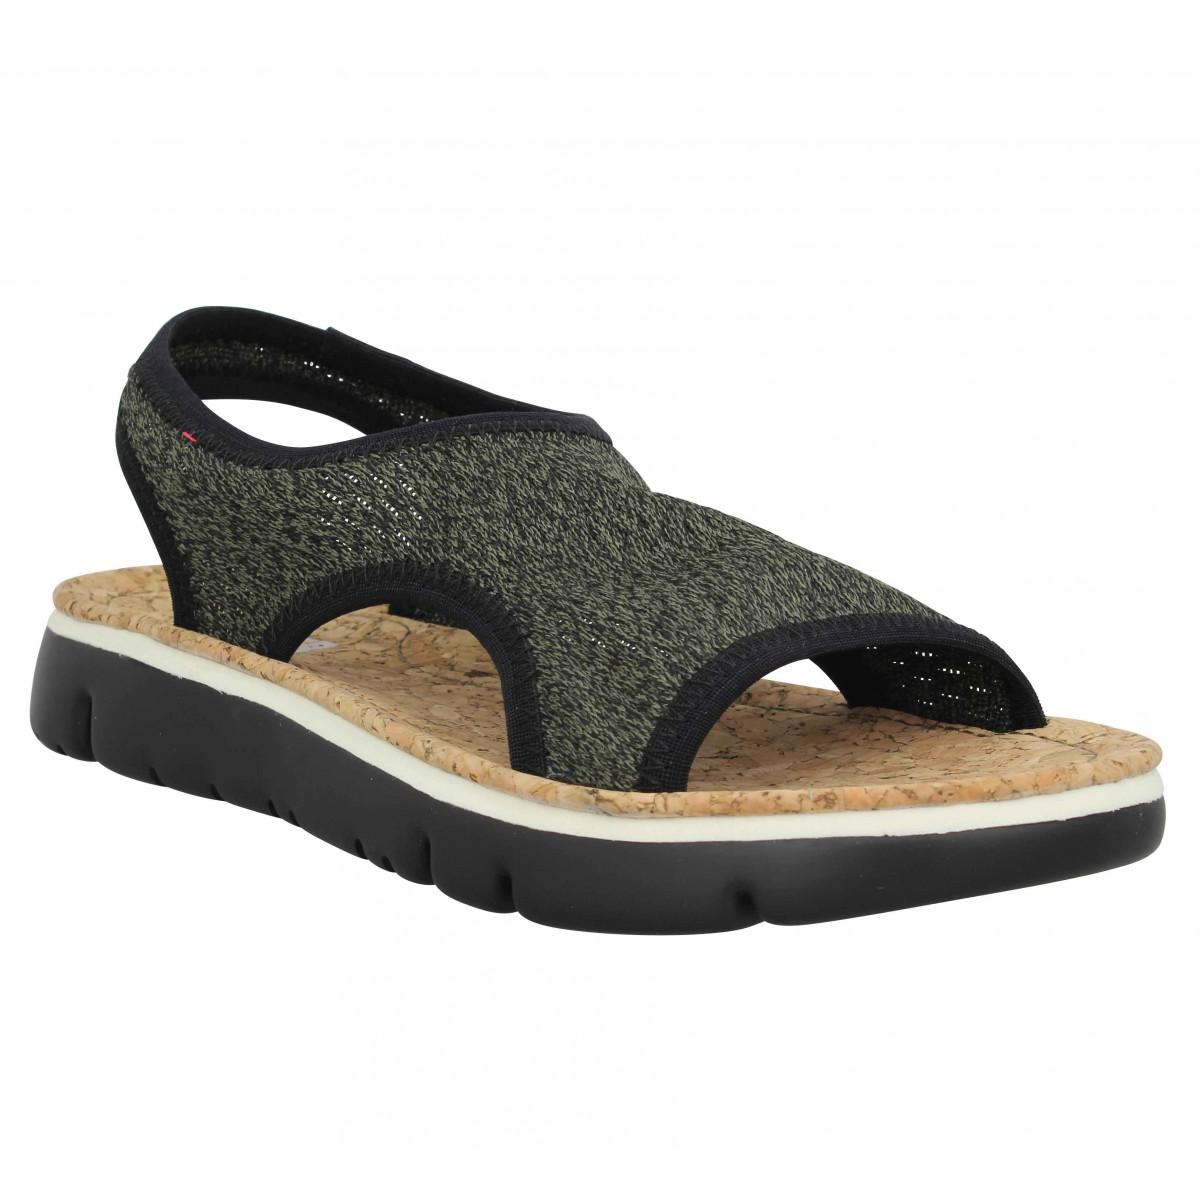 Camper Femme Oruga Sandal Toile -37-kiwi